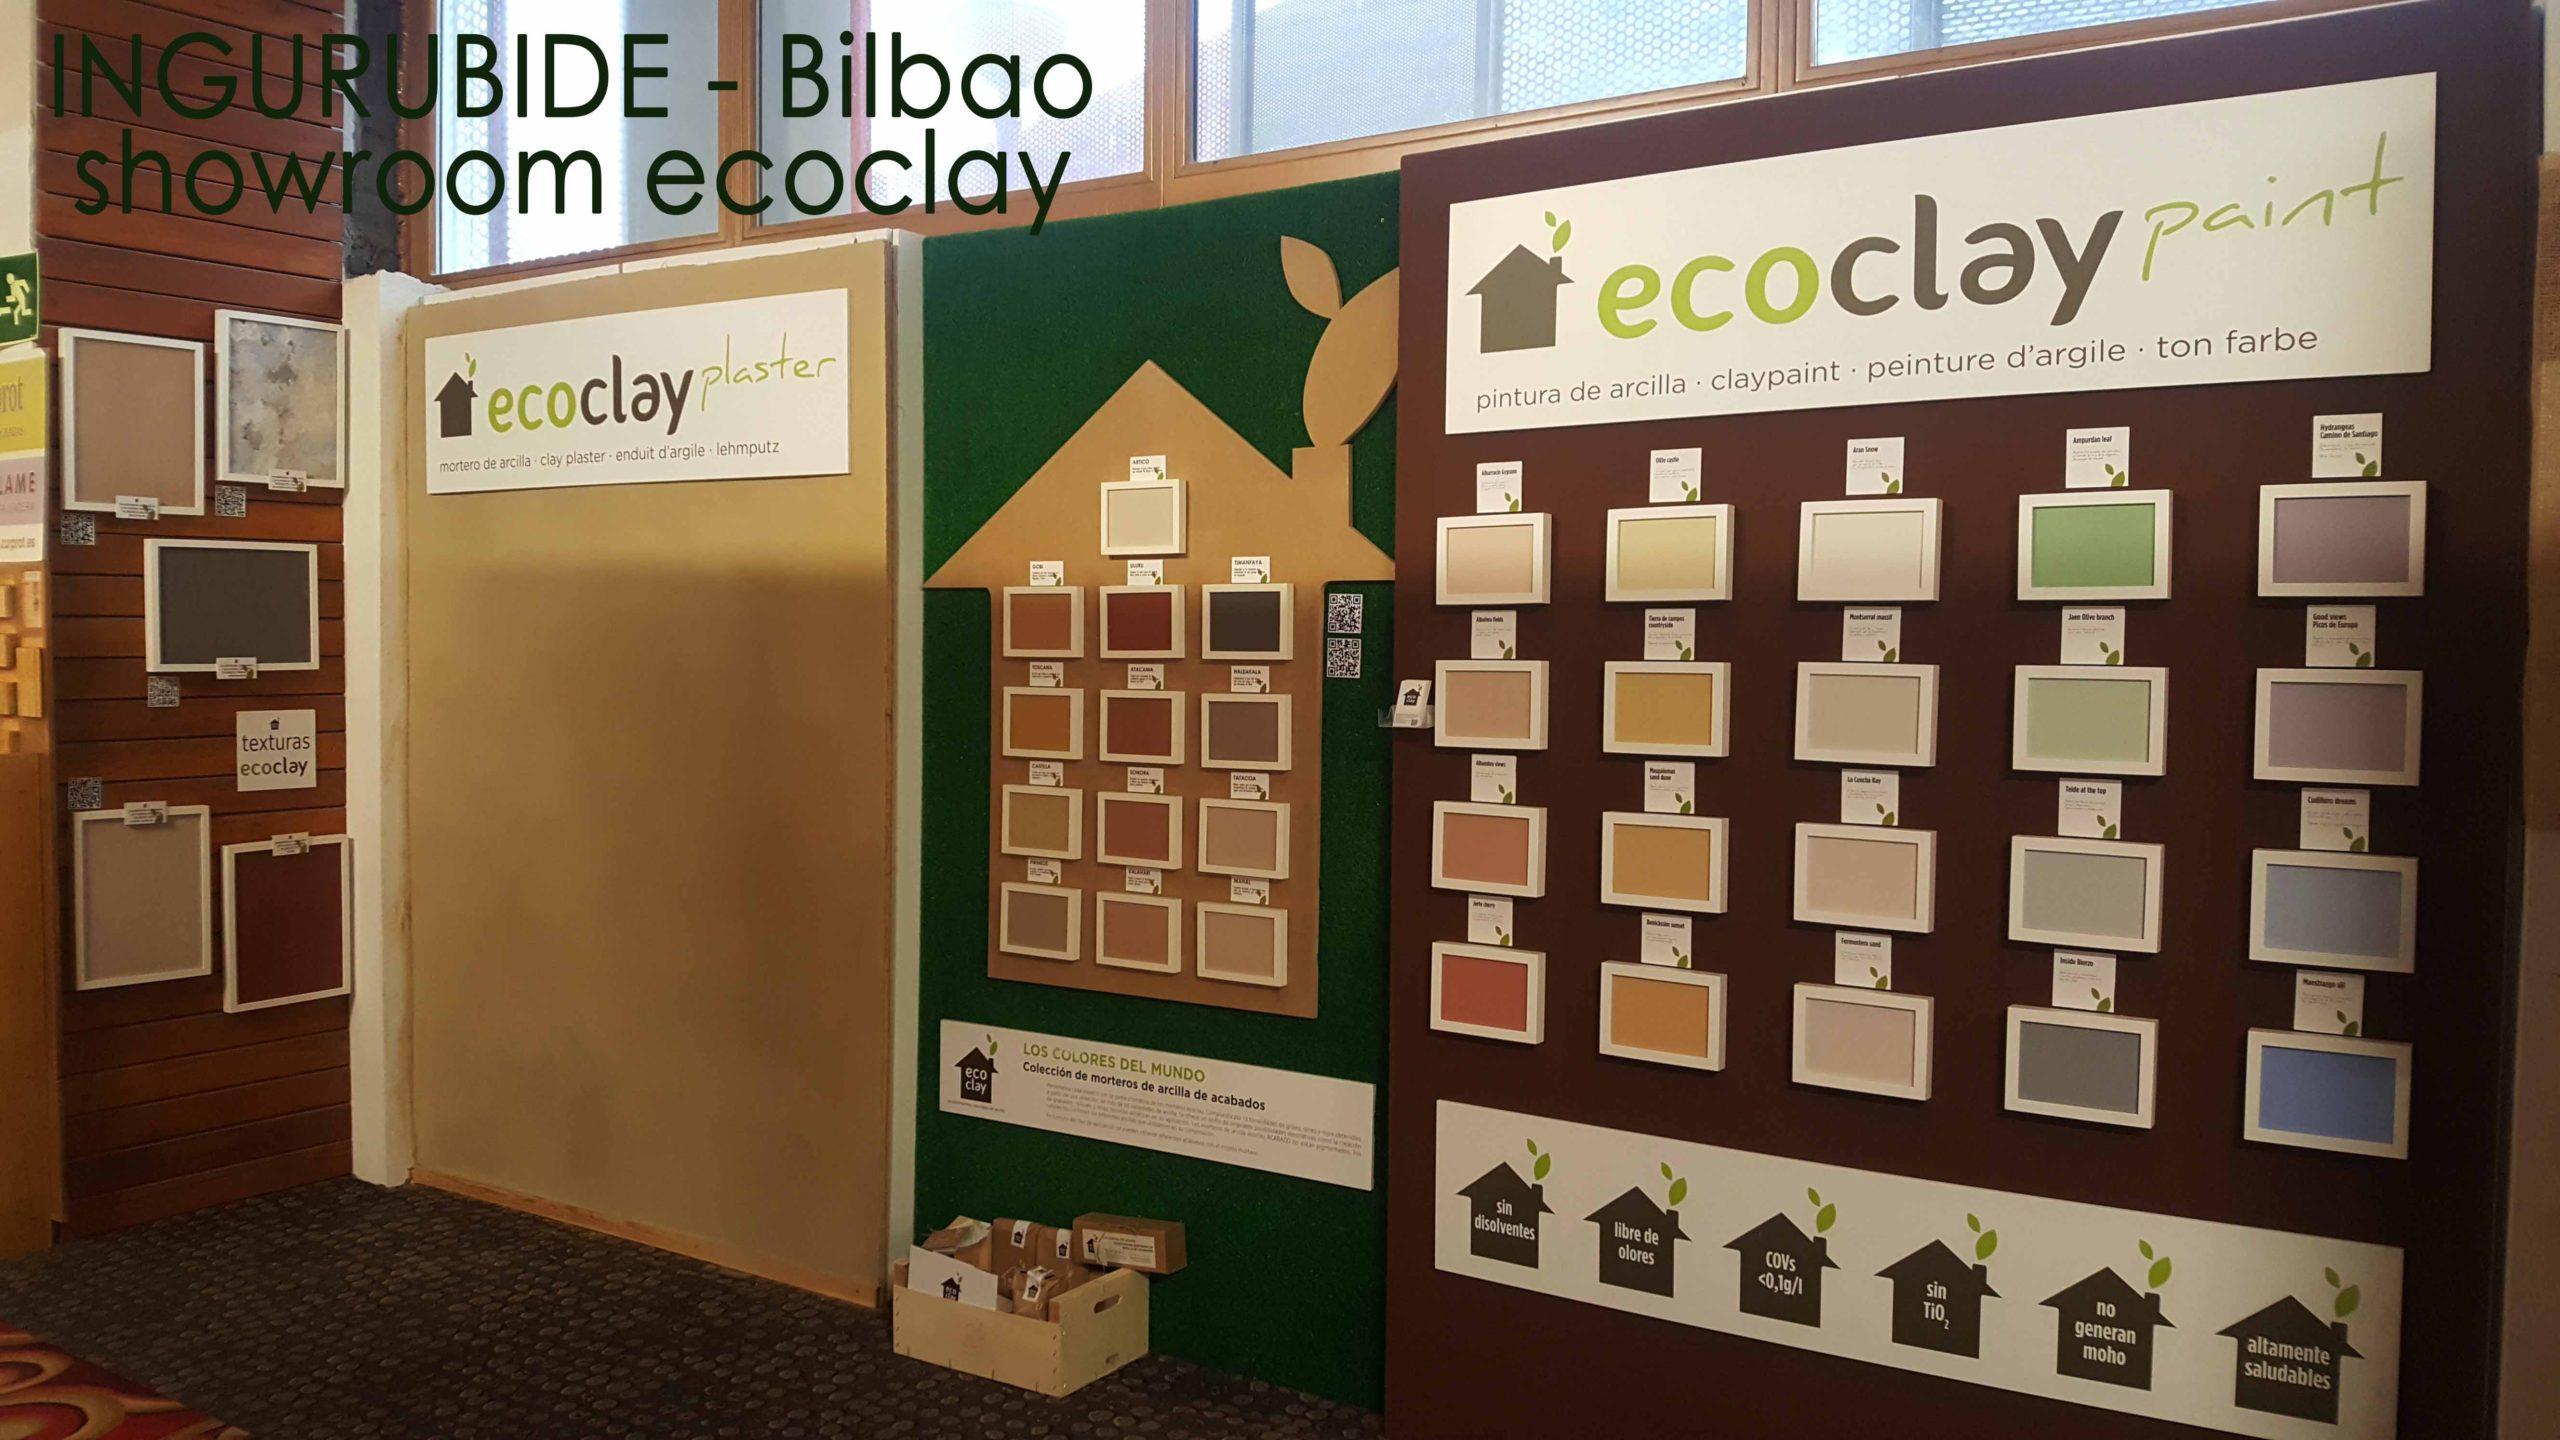 ingurubide bilbao ecoclay showroom